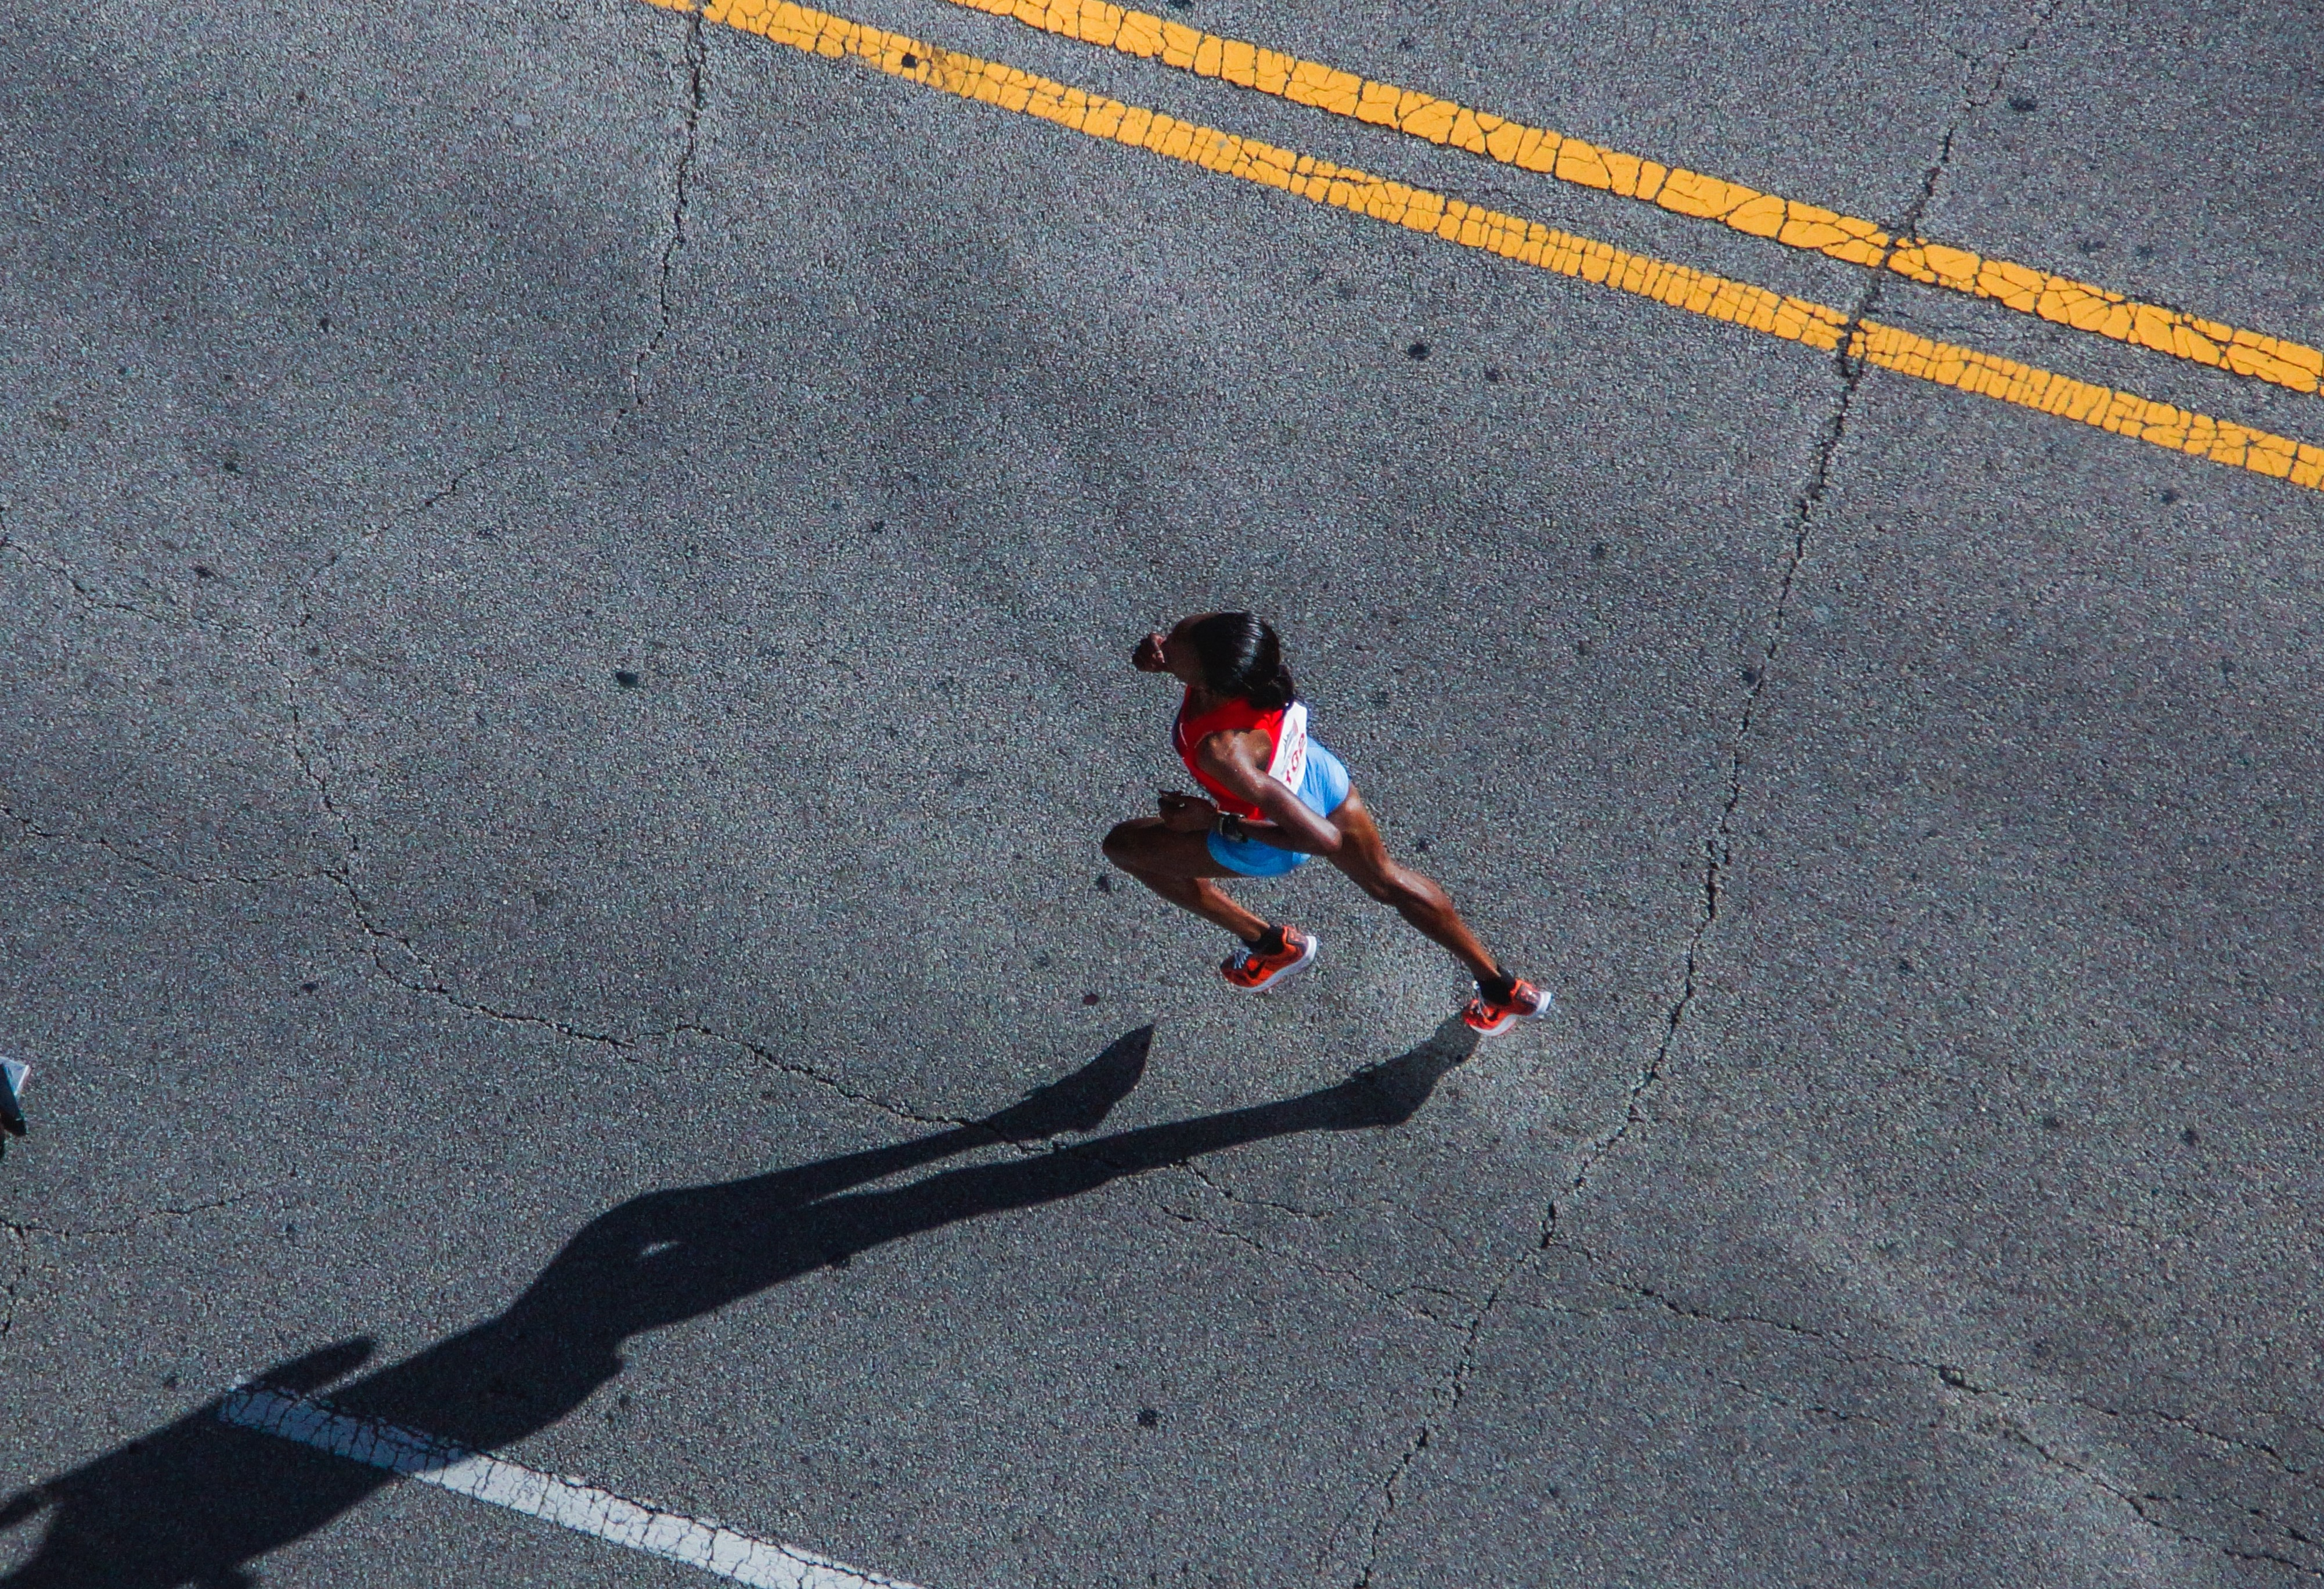 woman road sport running asphalt pavement 1179165 pxhere.com